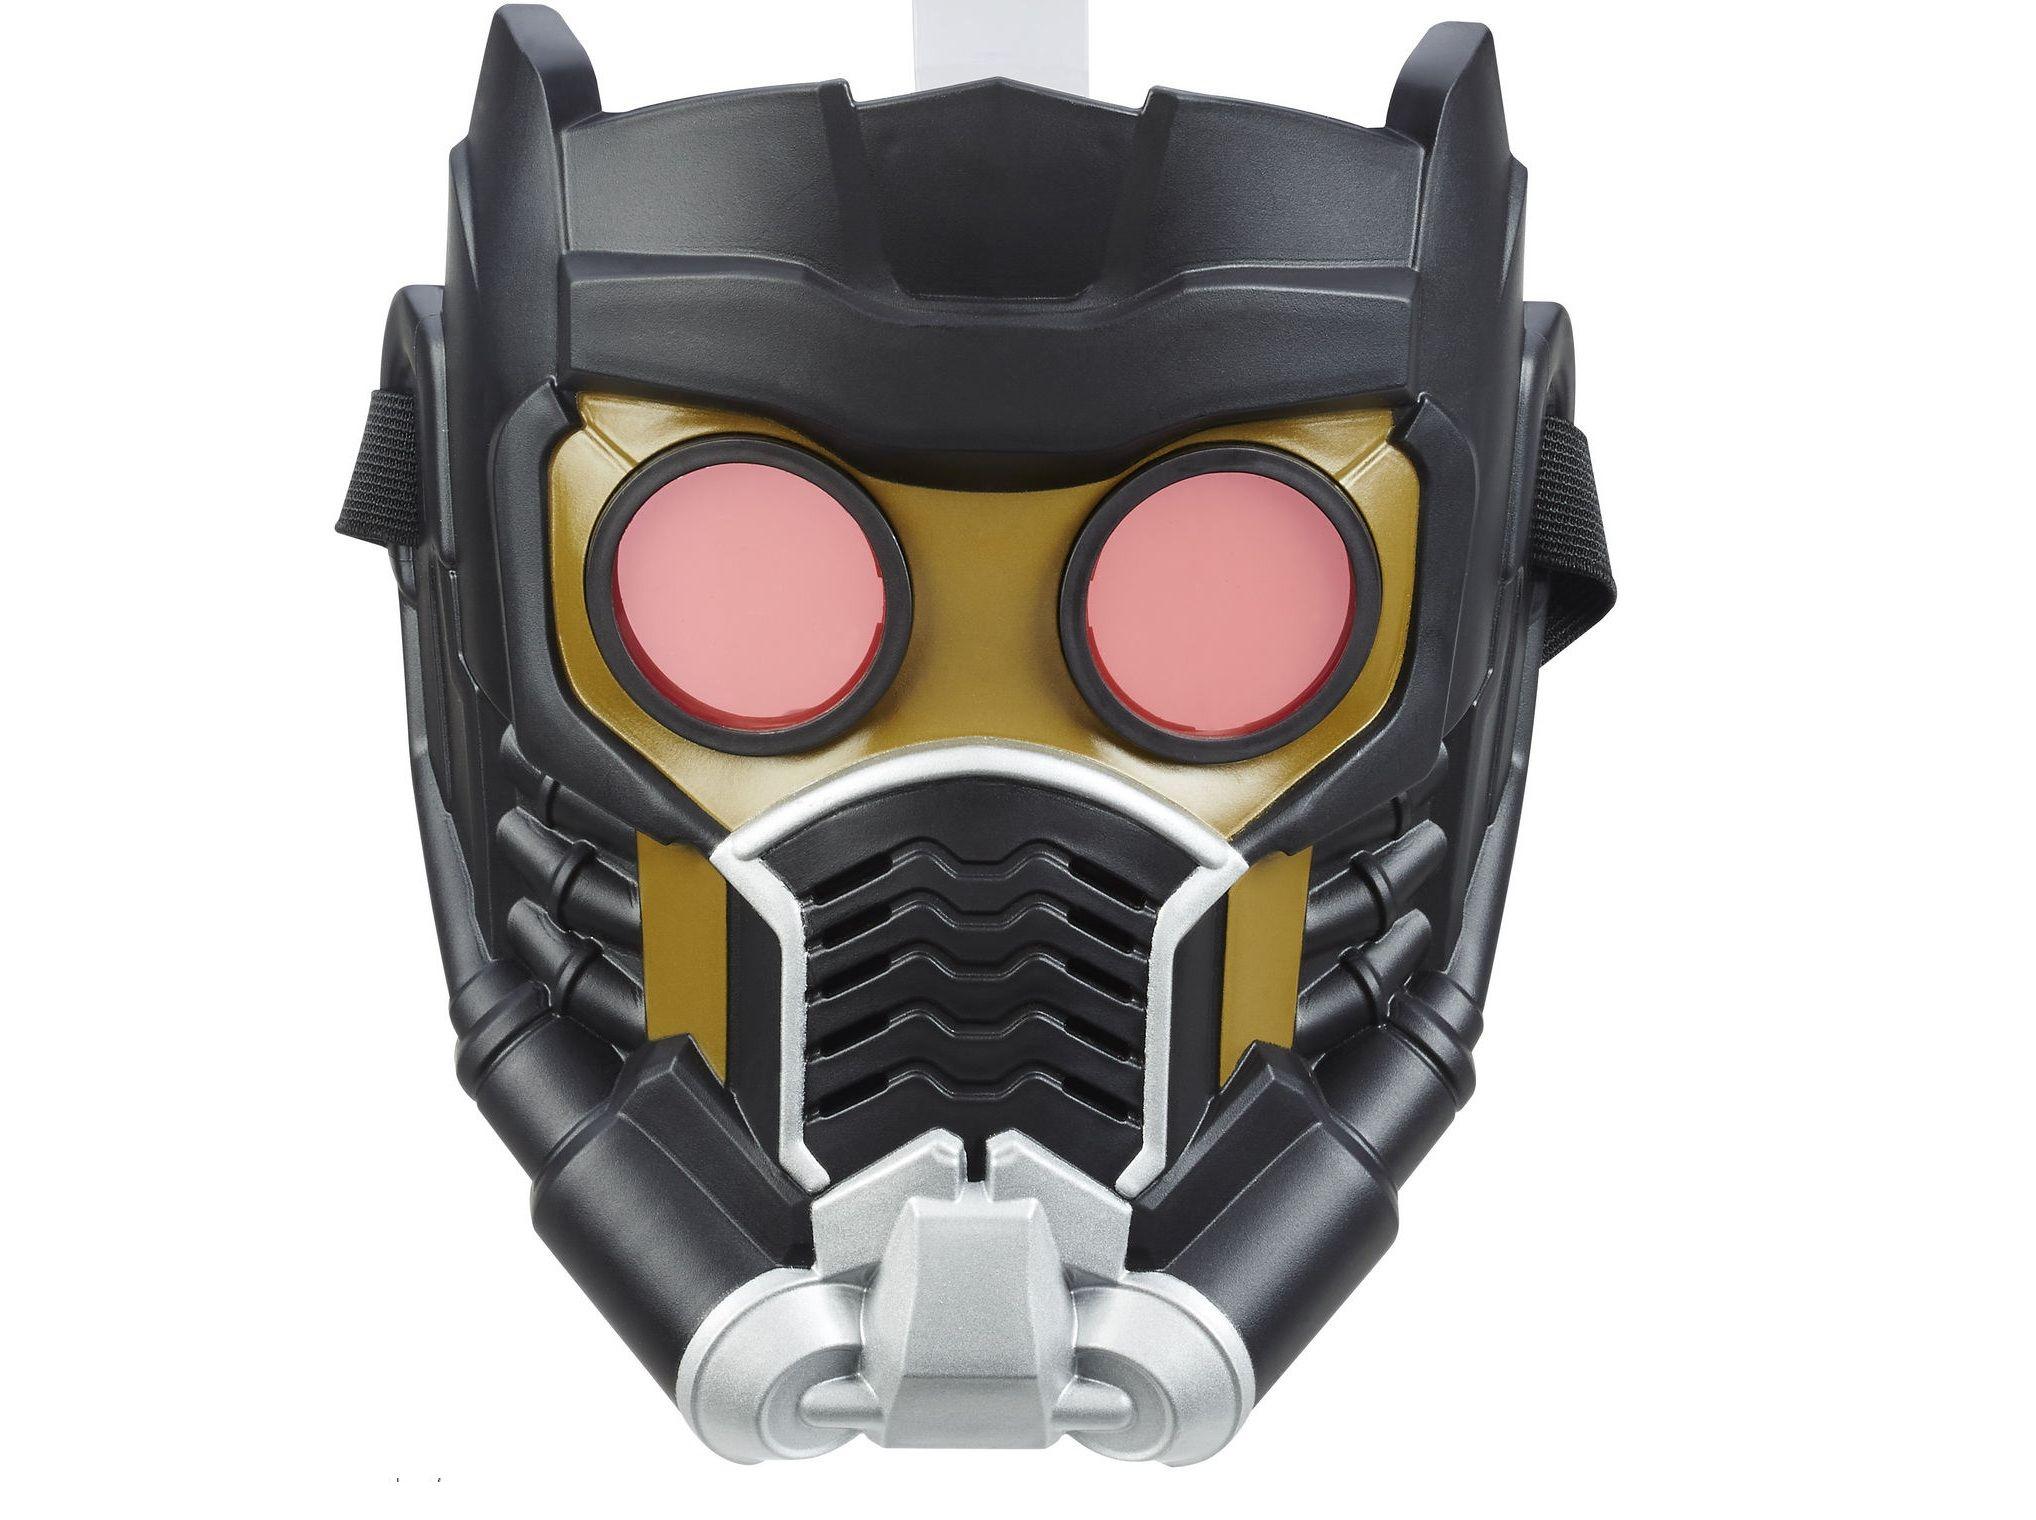 Star lord robotic mask